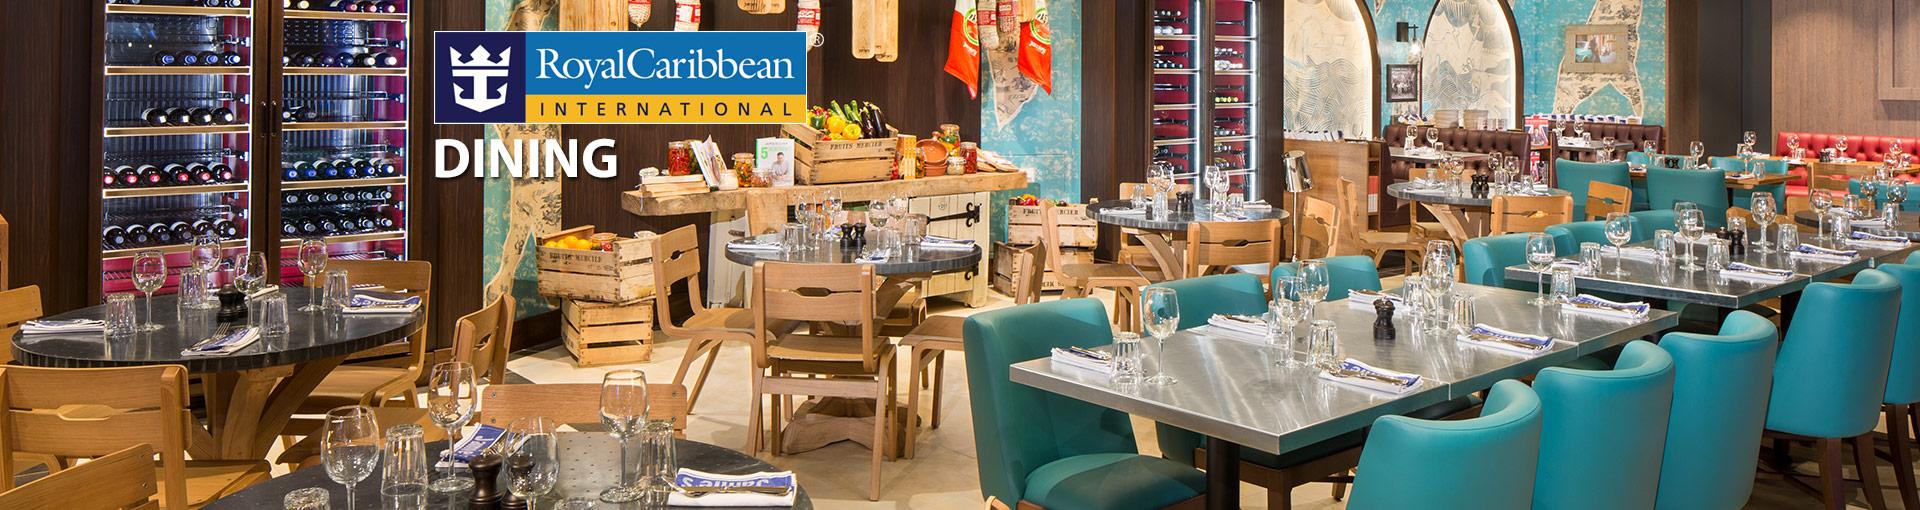 Royal Caribbean Dinning